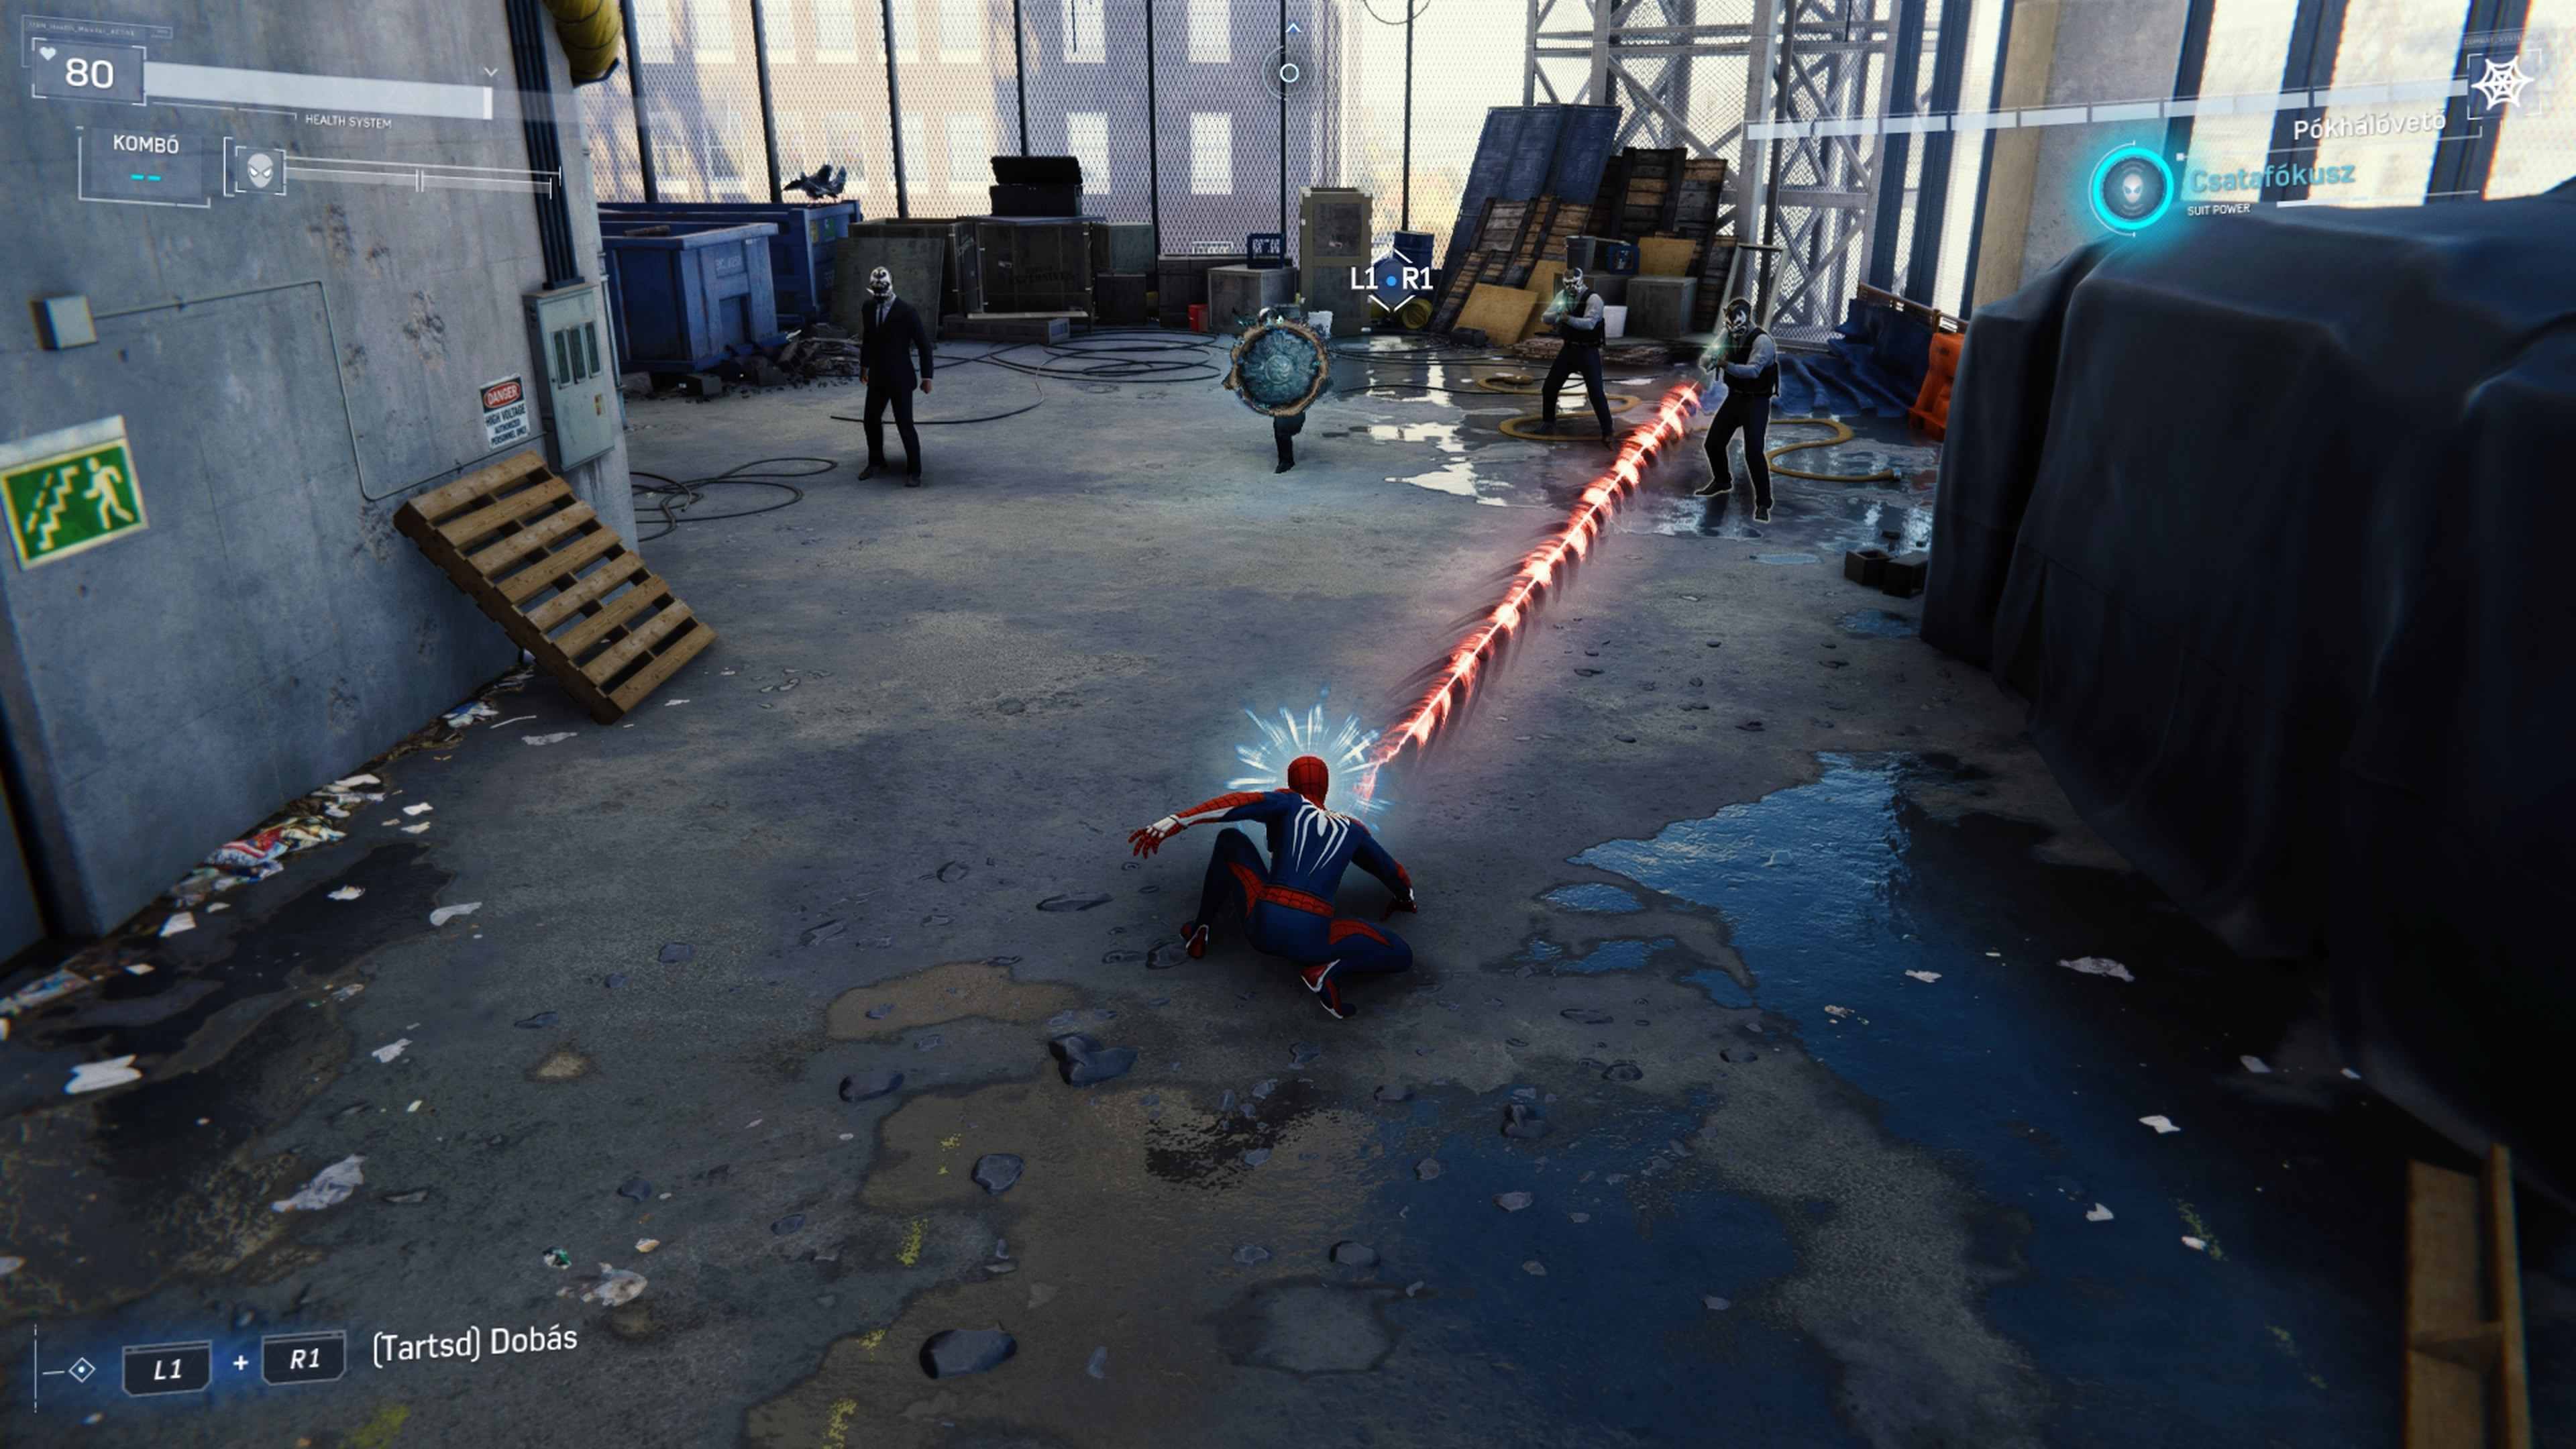 Marvel's Spider-Man jelenet a játékból